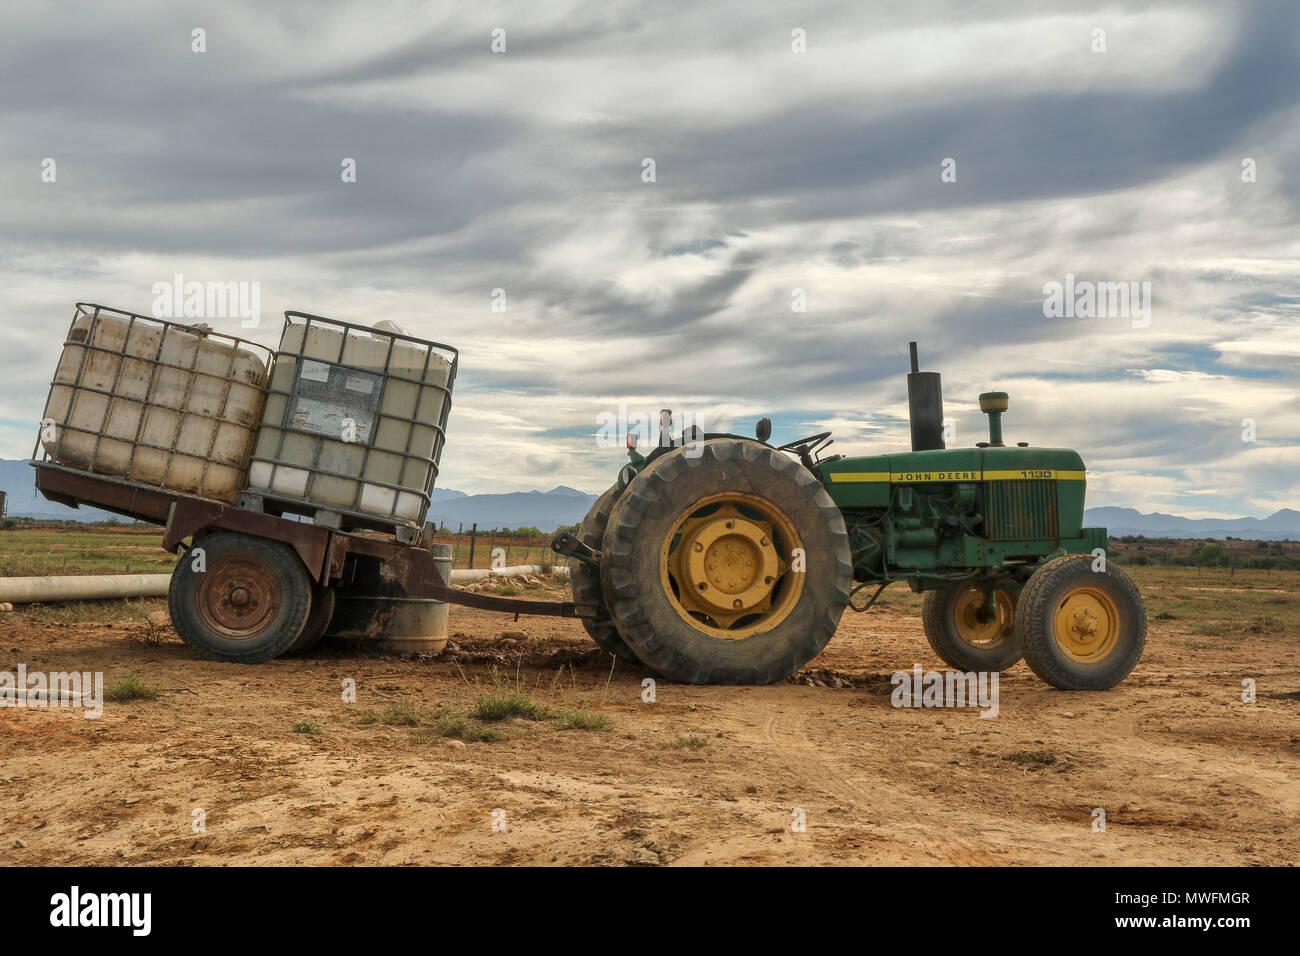 Garden Tractor Pull Stock Photos & Garden Tractor Pull Stock Images ...